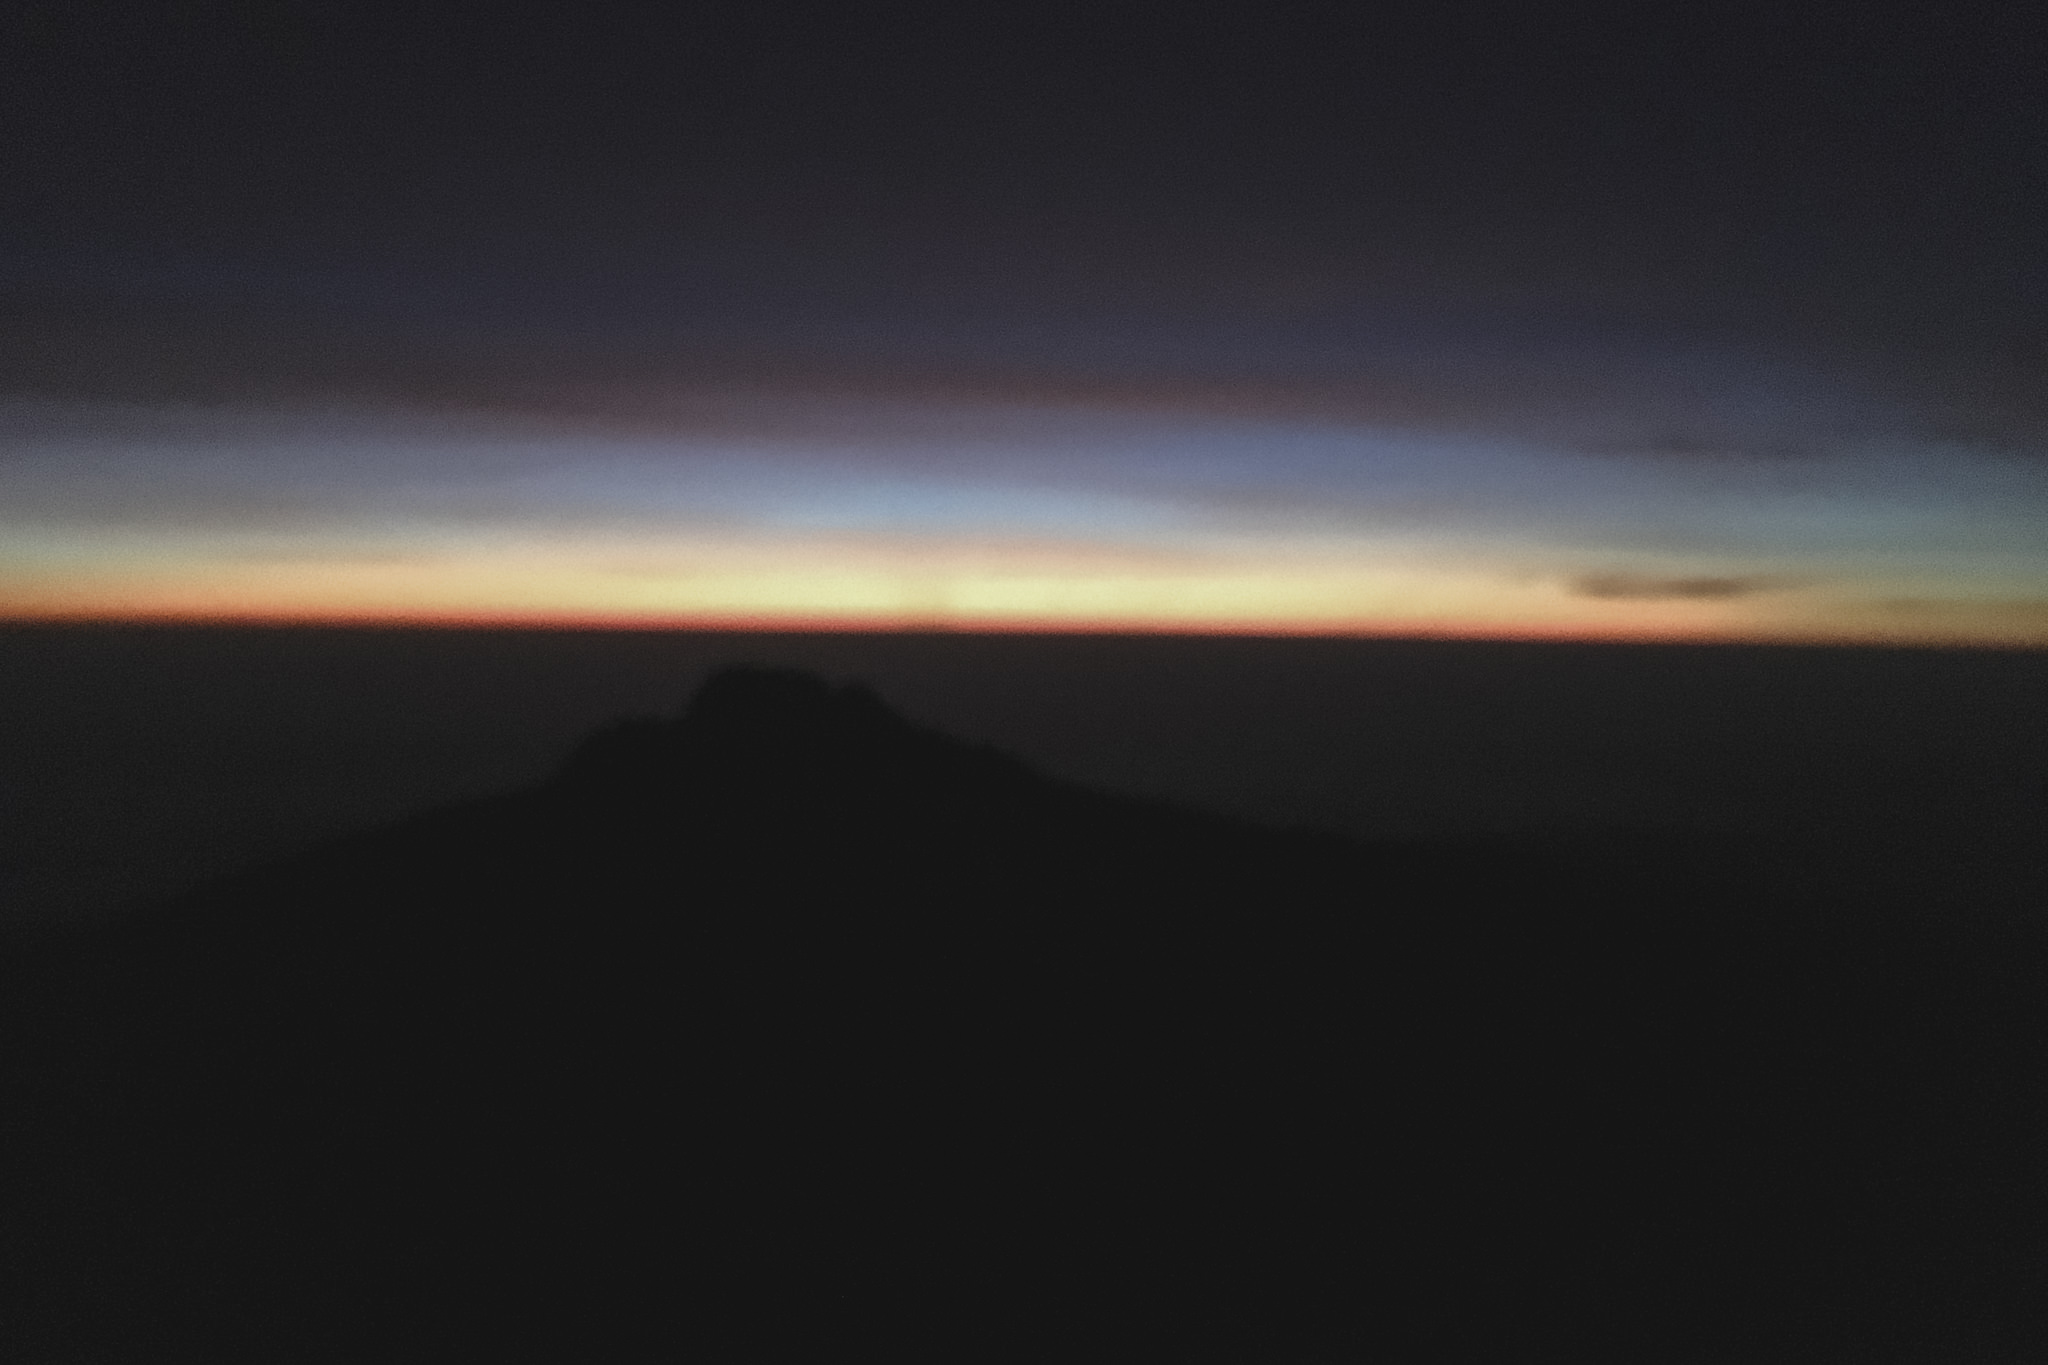 Kilimanjaro - 210